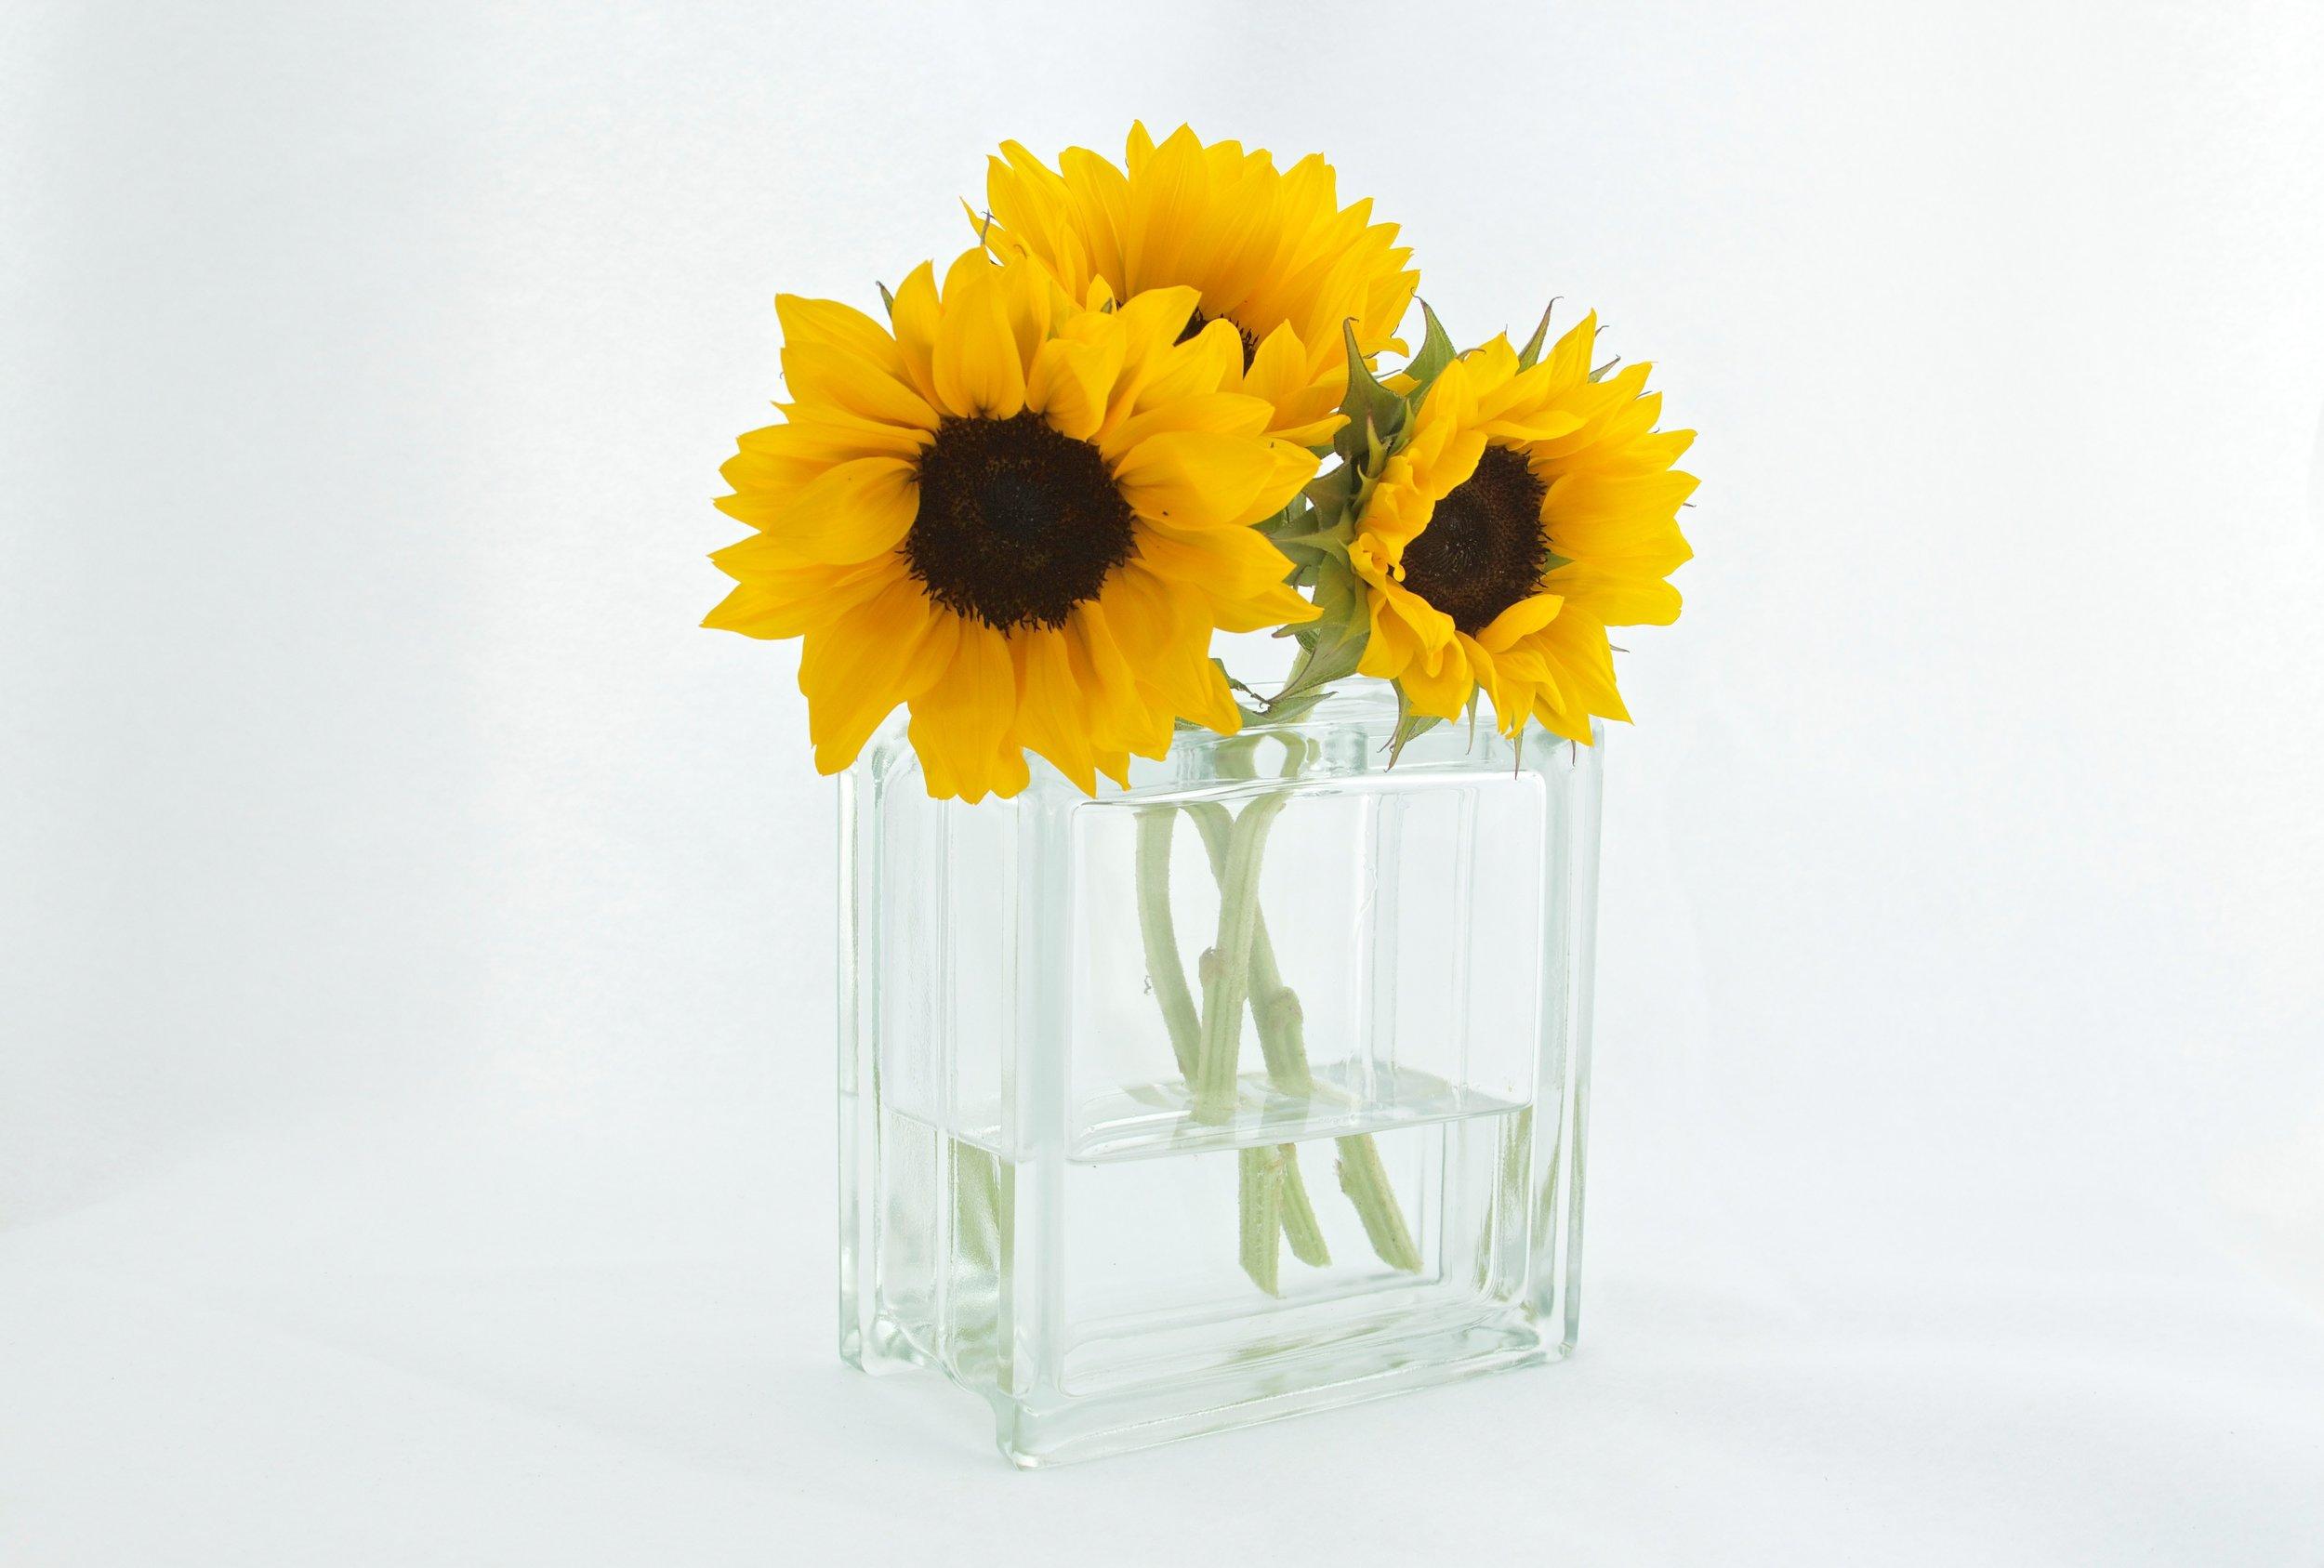 flowers-sunflowers-vase-12581.jpg